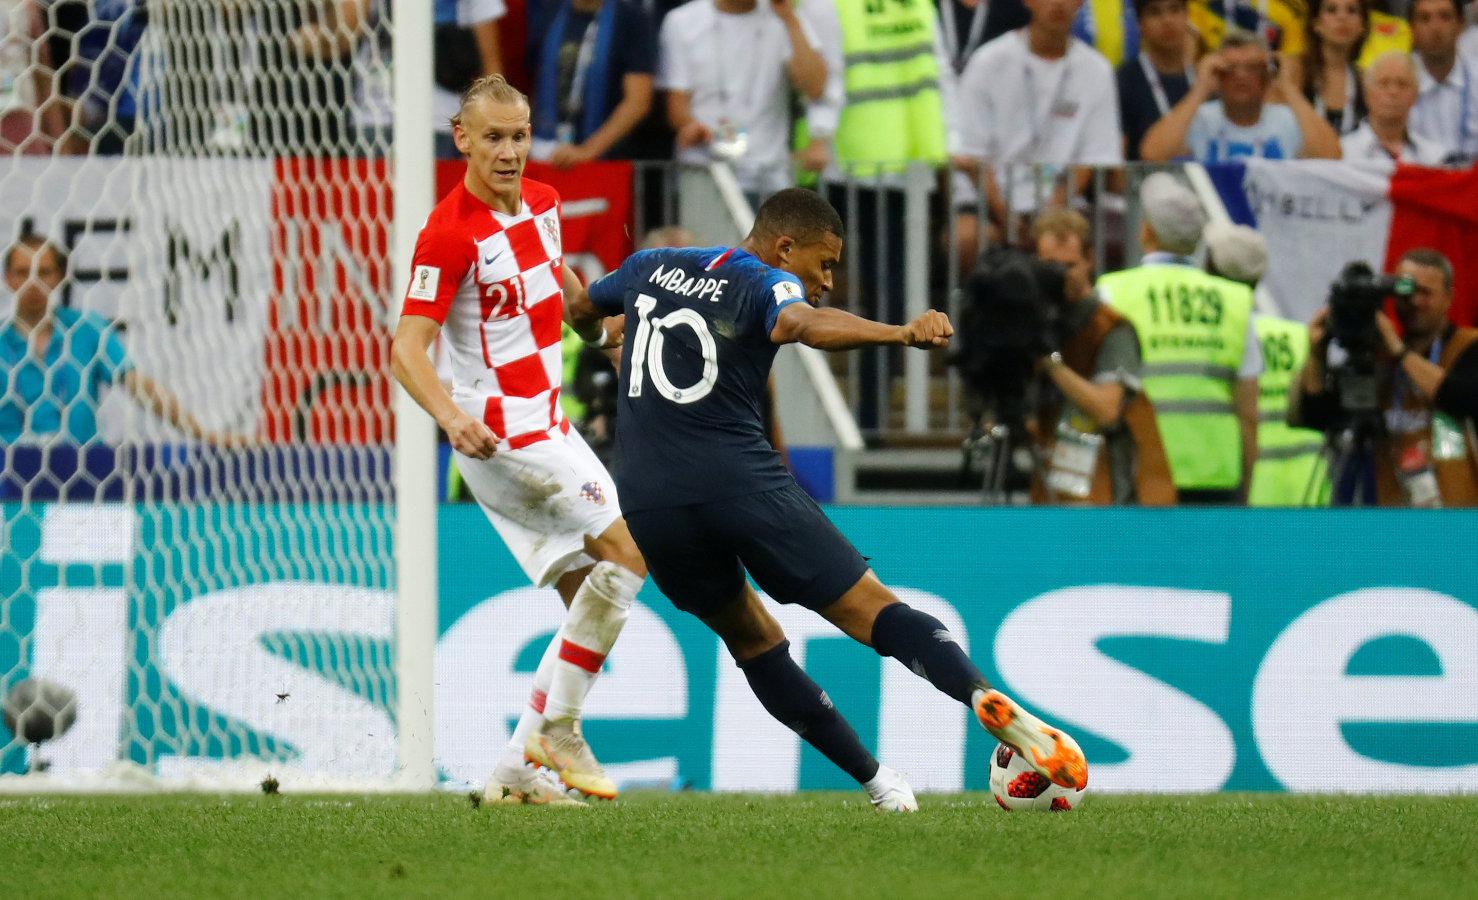 Soccer Football - World Cup - Final - France v Croatia - Luzhniki Stadium, Moscow, Russia - July 15, 2018  France's Kylian Mbappe scores their fourth goal   REUTERS/Kai Pfaffenbach